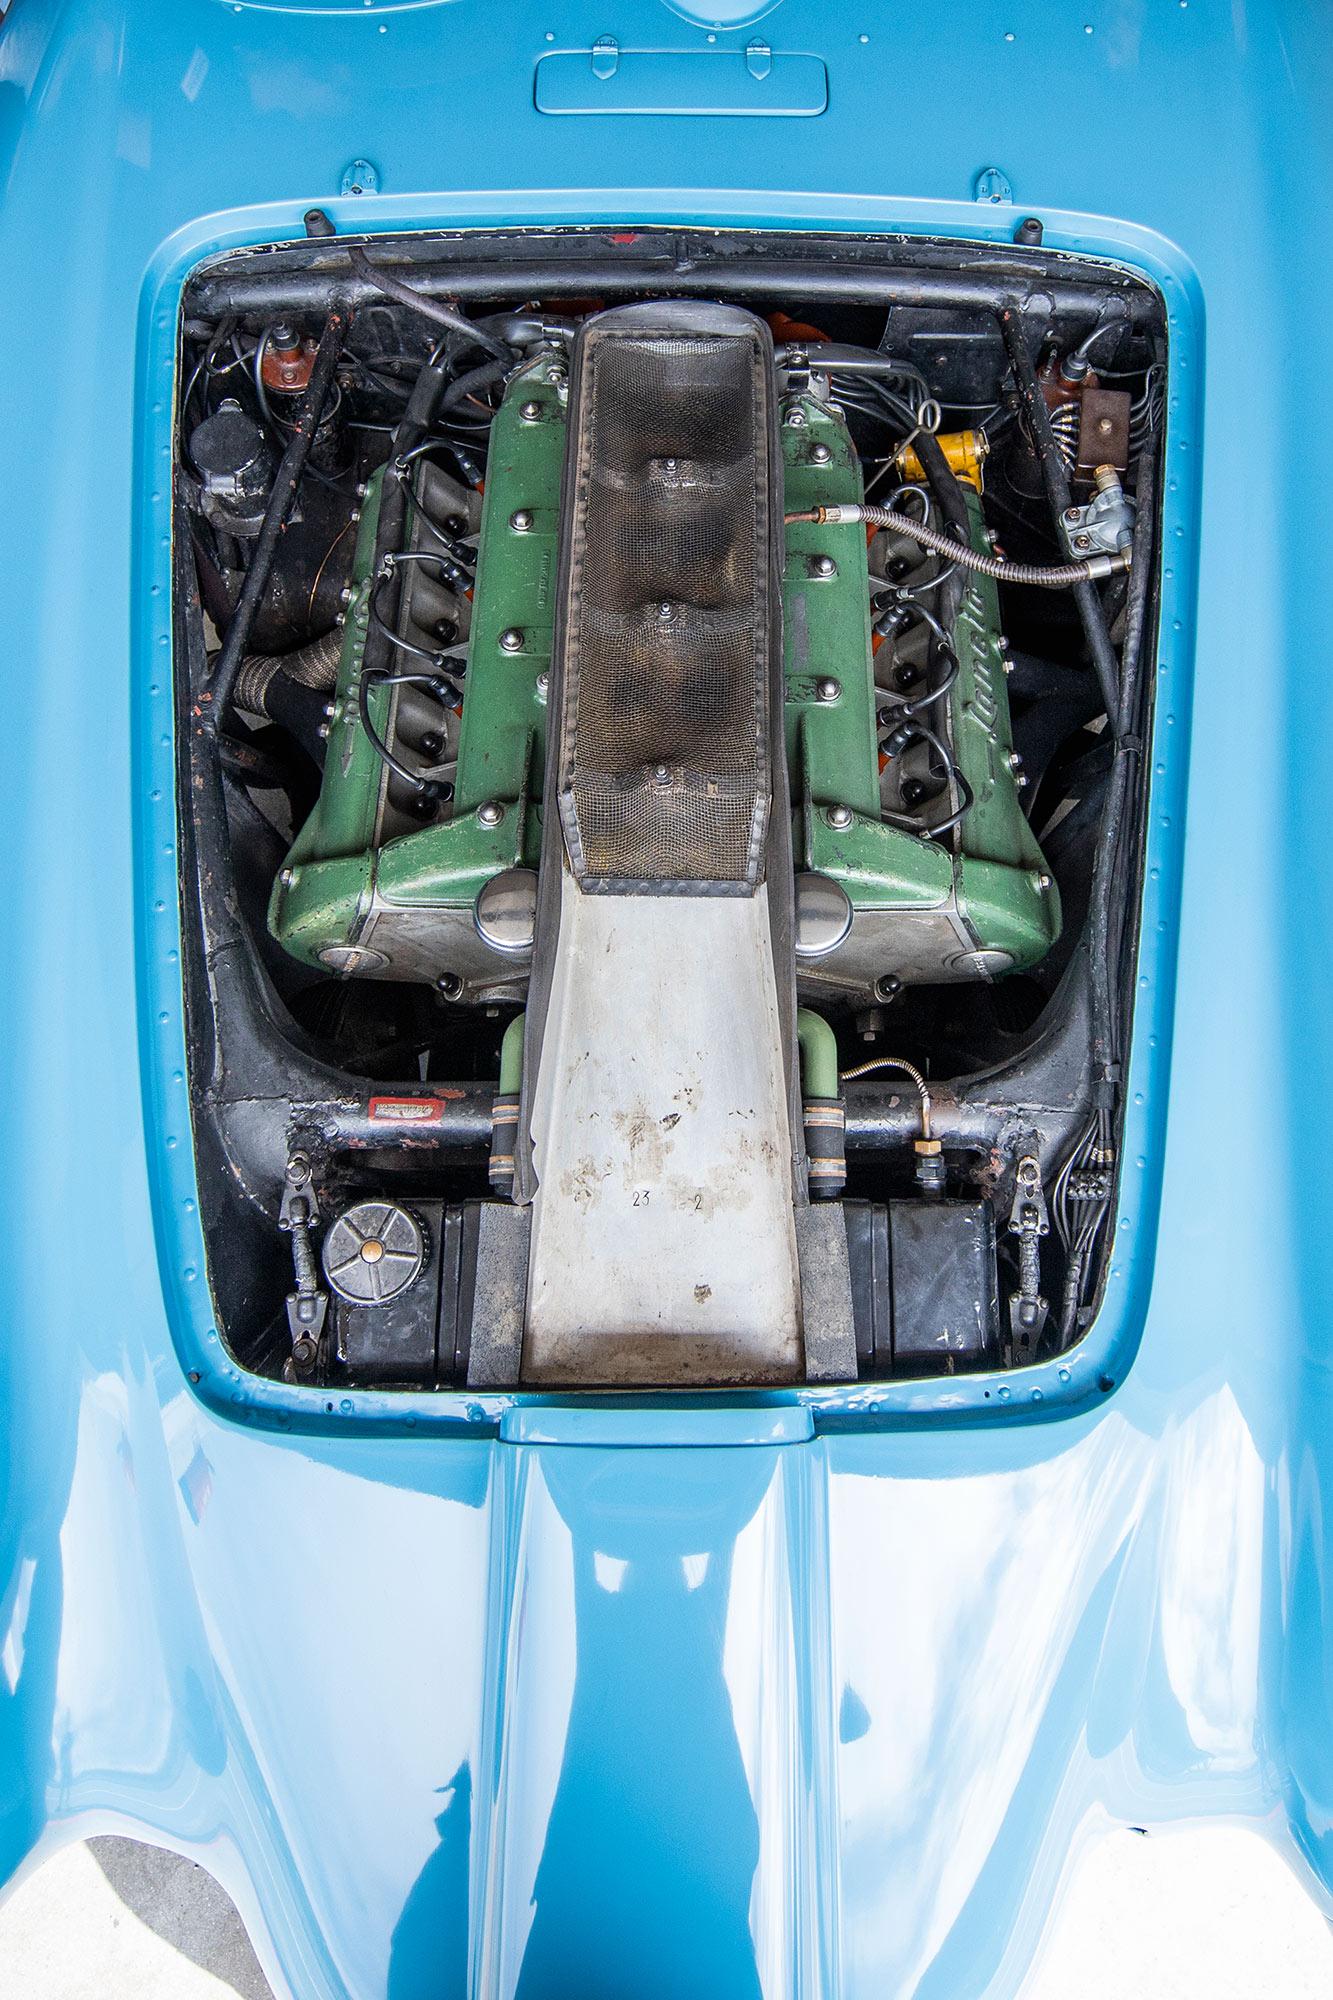 #46, Lancia, D20, D23, D24, Spyder, Mille Miglia, Panamericana